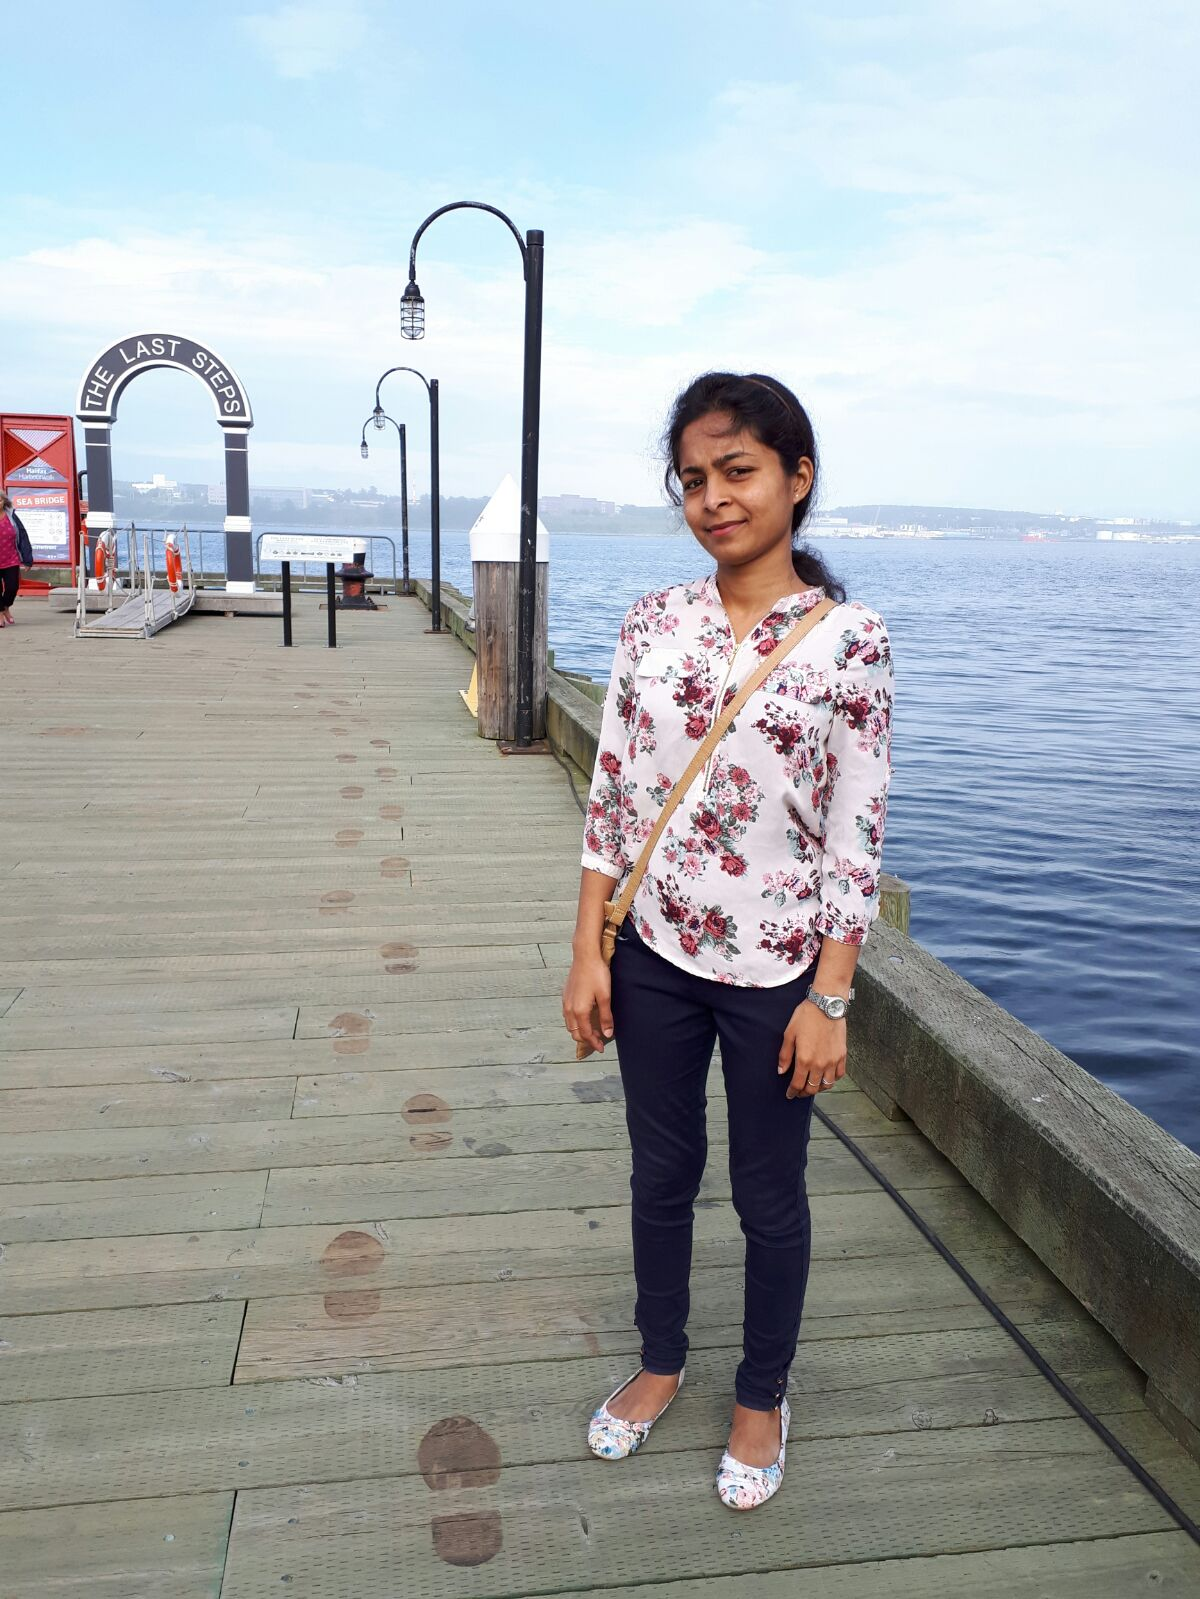 Janice Lobo from India Saint Mary's University- MSc in Computing and Data Analytics